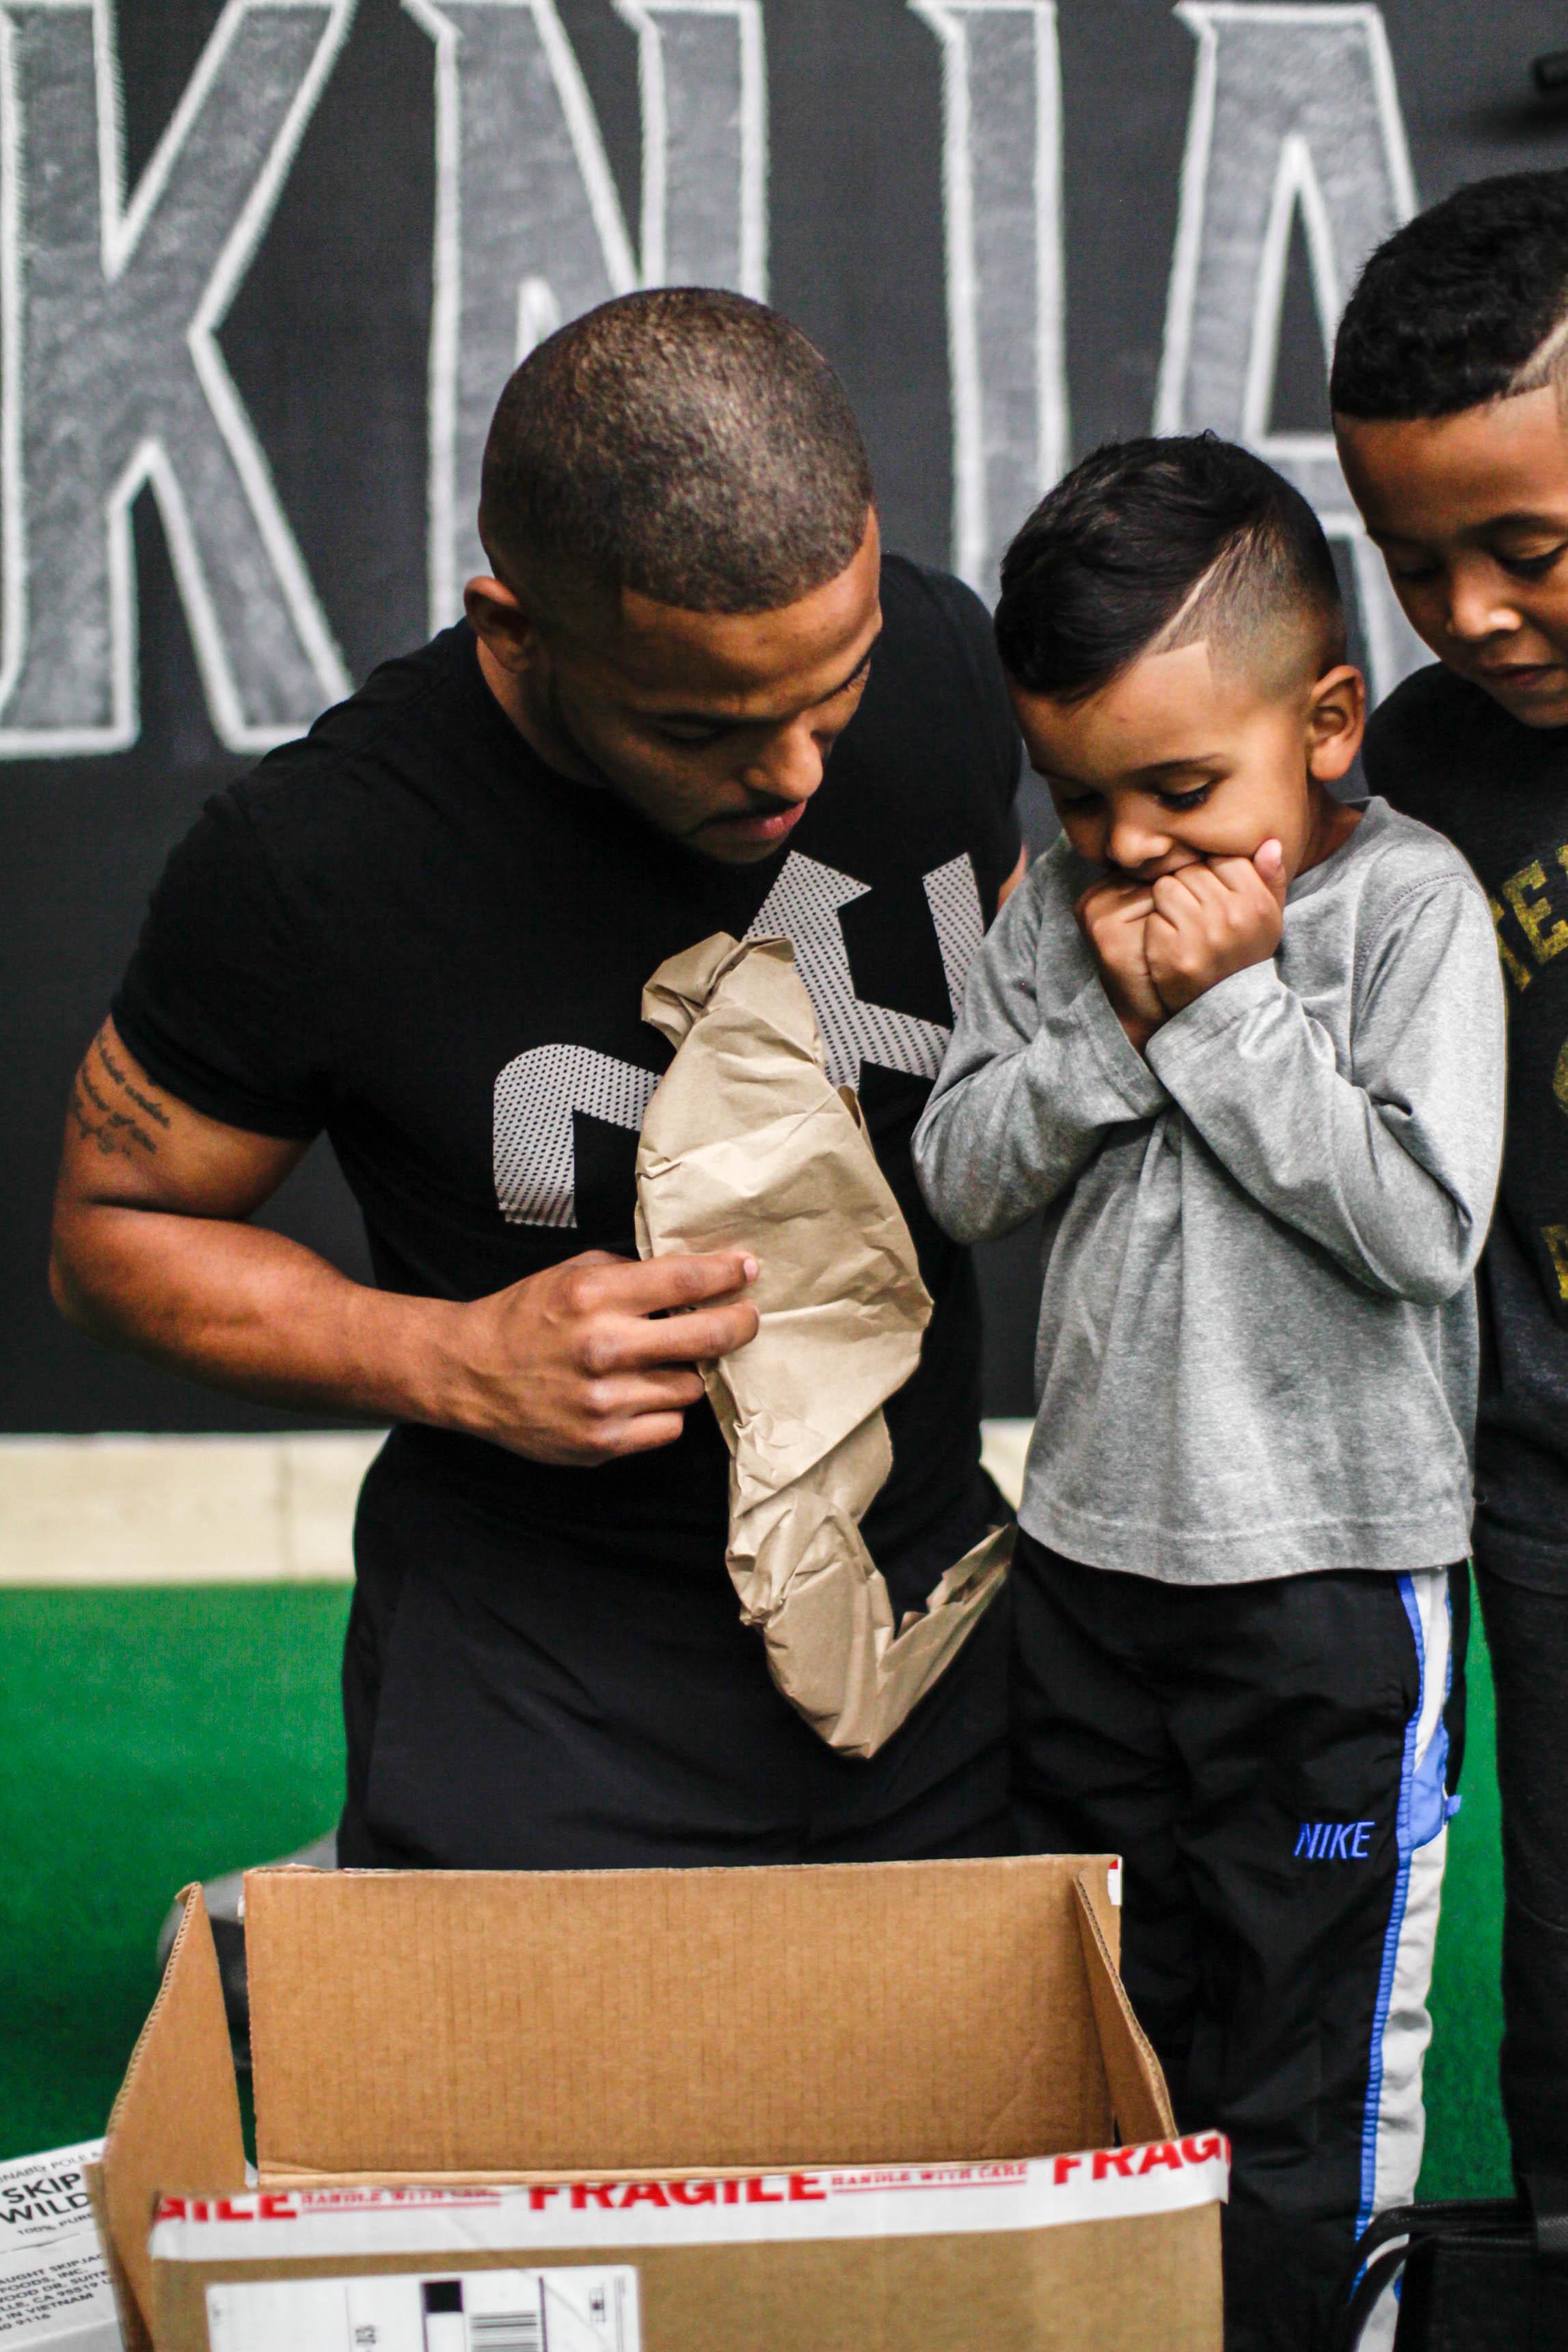 Kid's Boxing Classes near Wheaton, Illinois